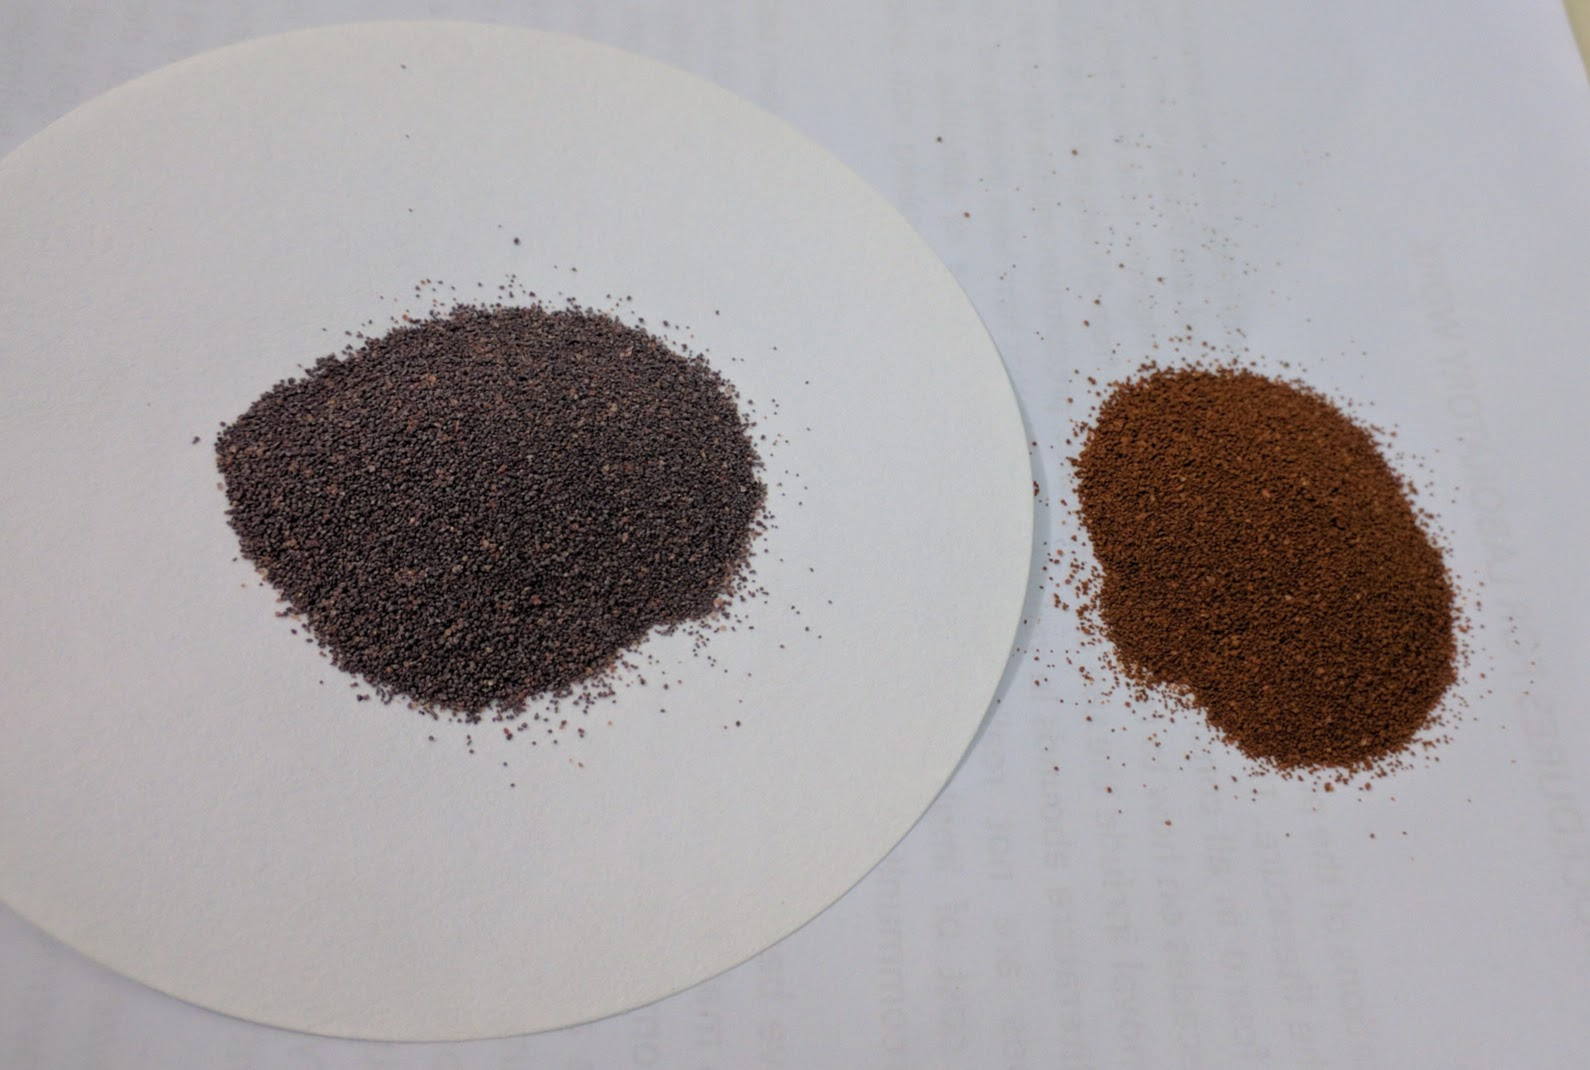 Heat activated laterite-alumina composite (left) vs. raw laterite (right).